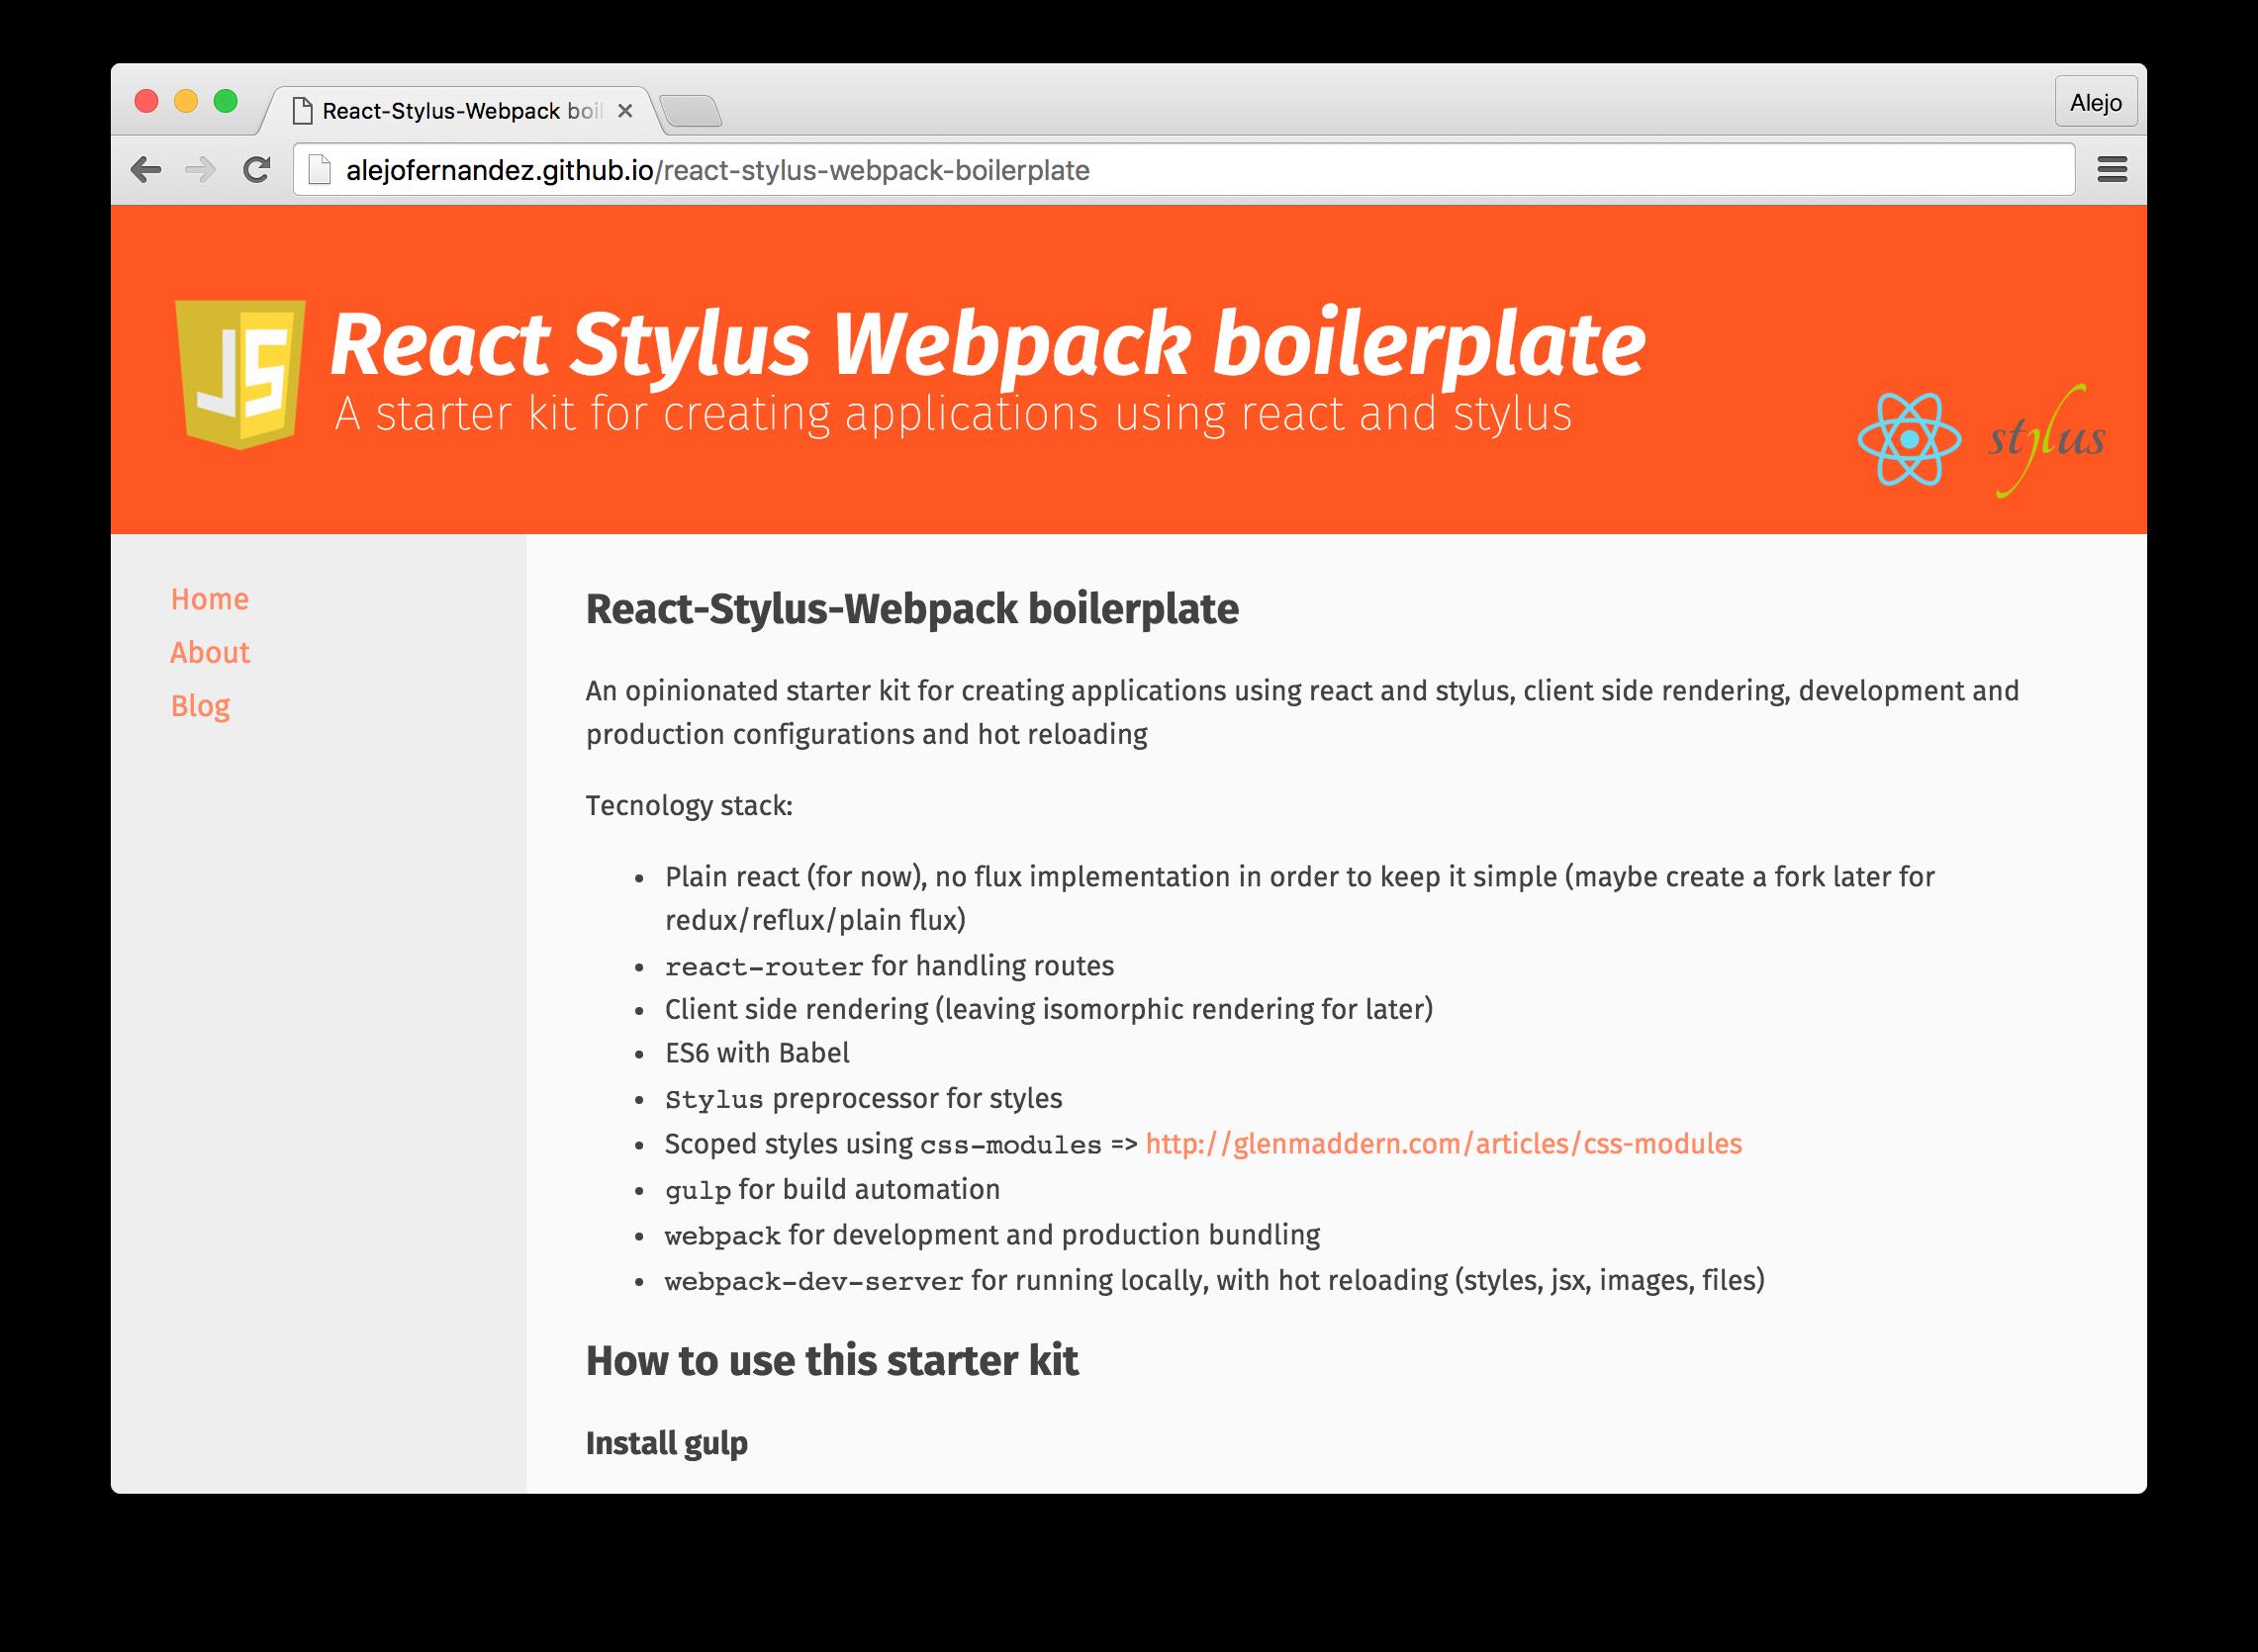 react-stylus-webpack-boilerplate